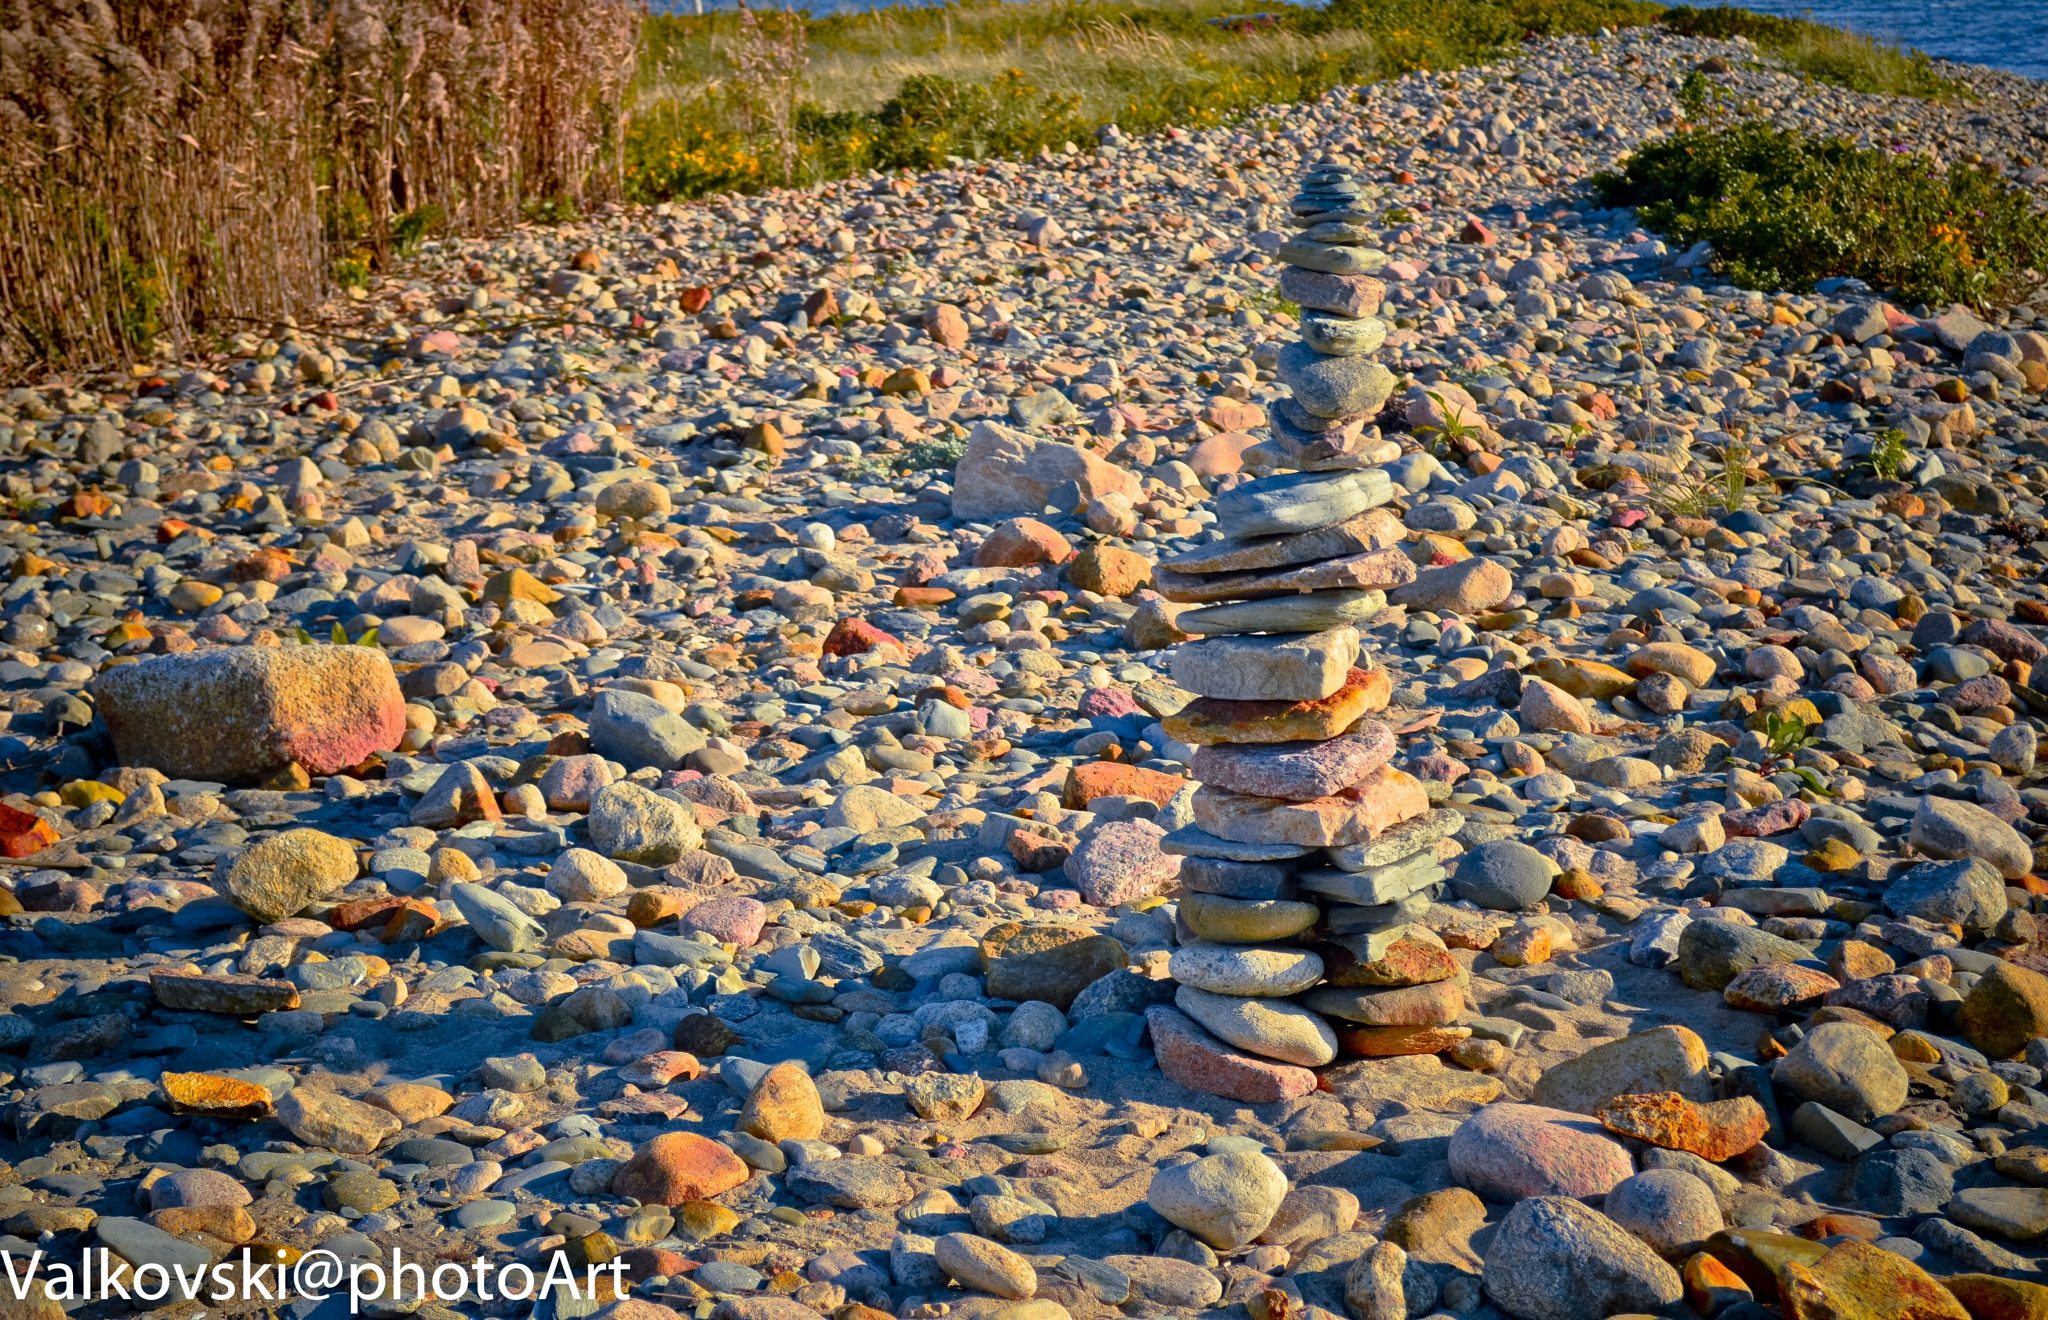 Pebble beach- I  by valkovskipv59